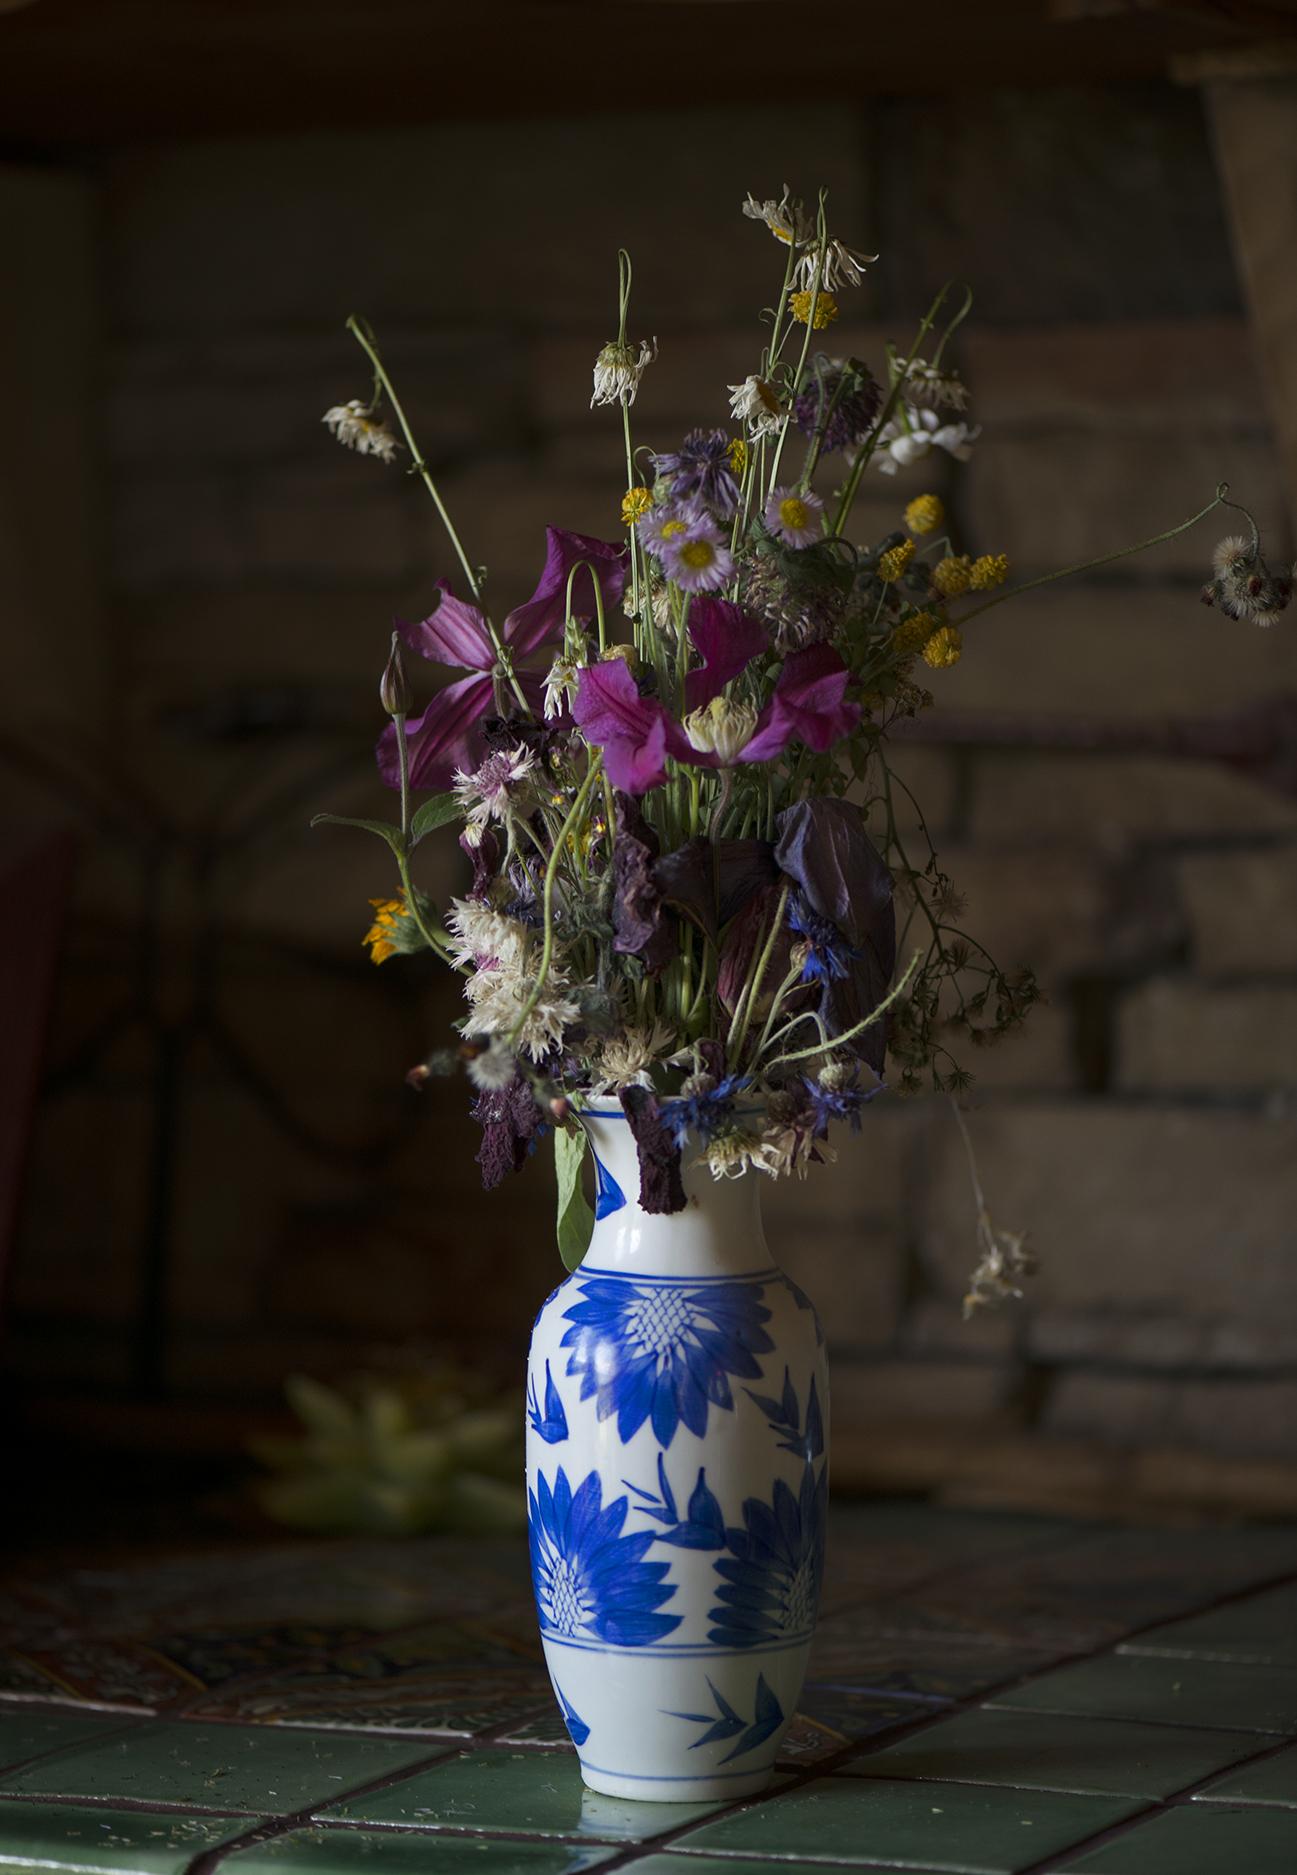 Maggie's blue vase